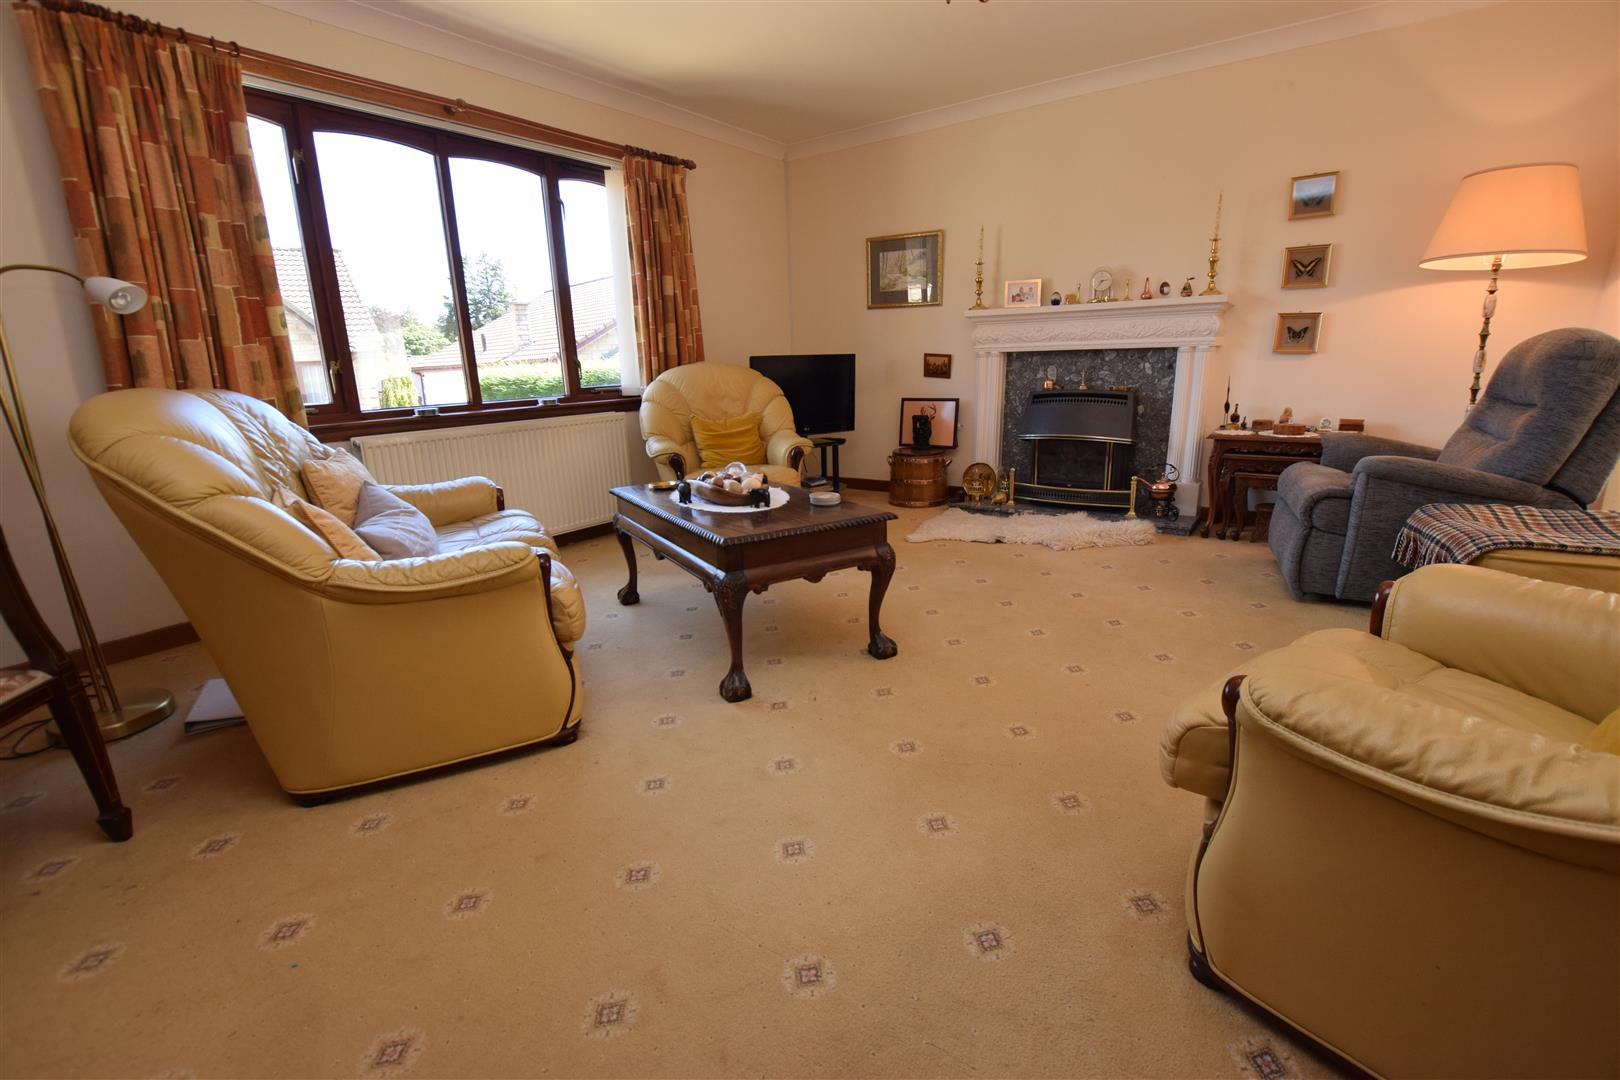 Glenorchil Crescent, Auchterarder, Perthshire, PH3 1PY, UK